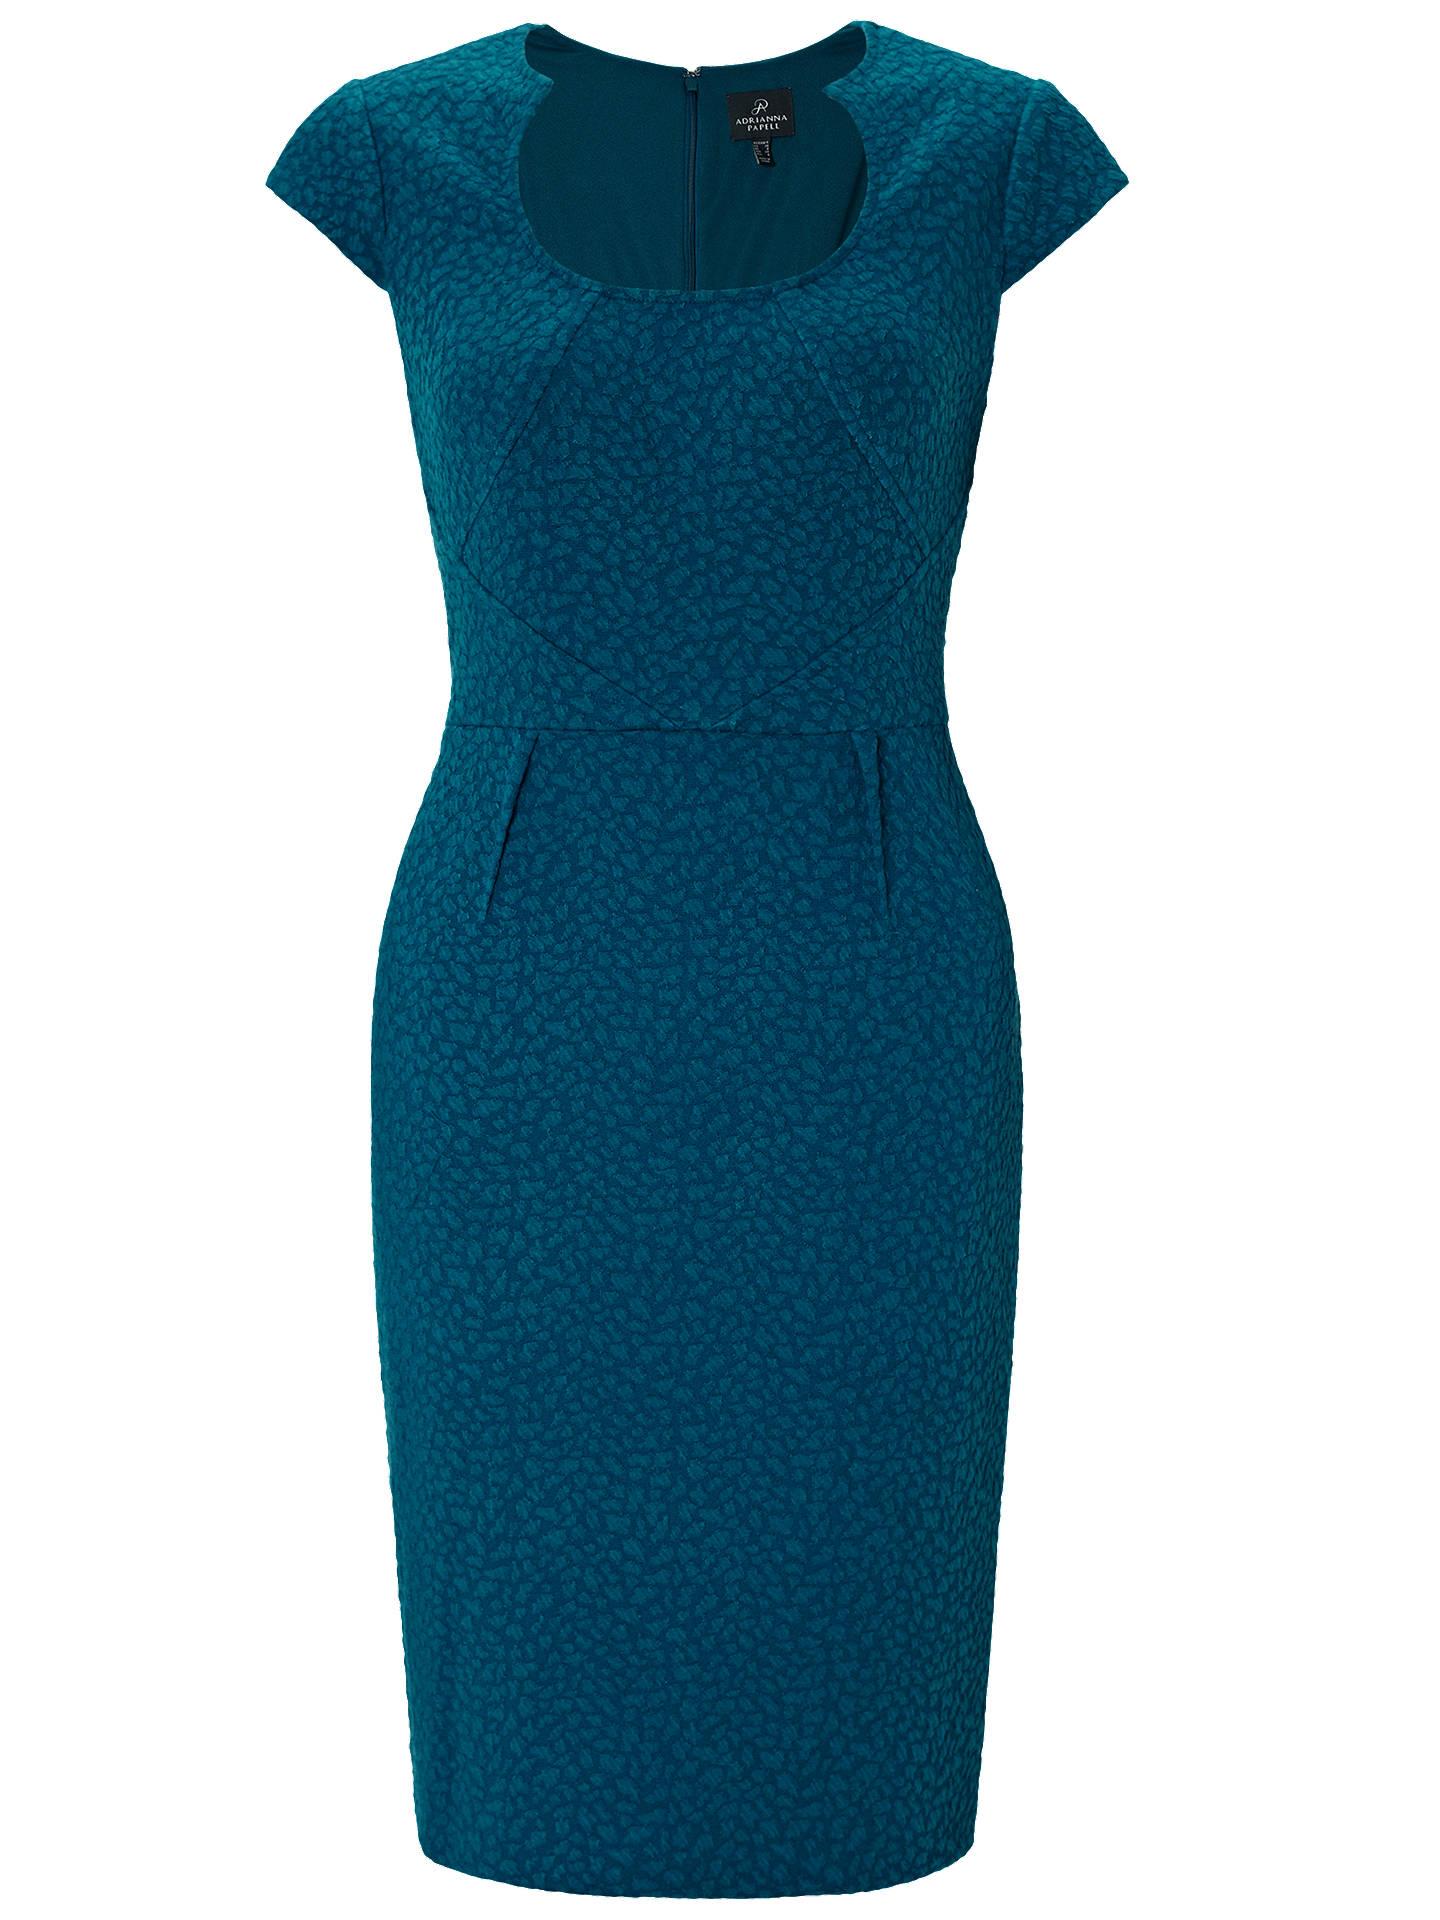 Adrianna Papell Illusion Bodice Jersey Sheath Dress